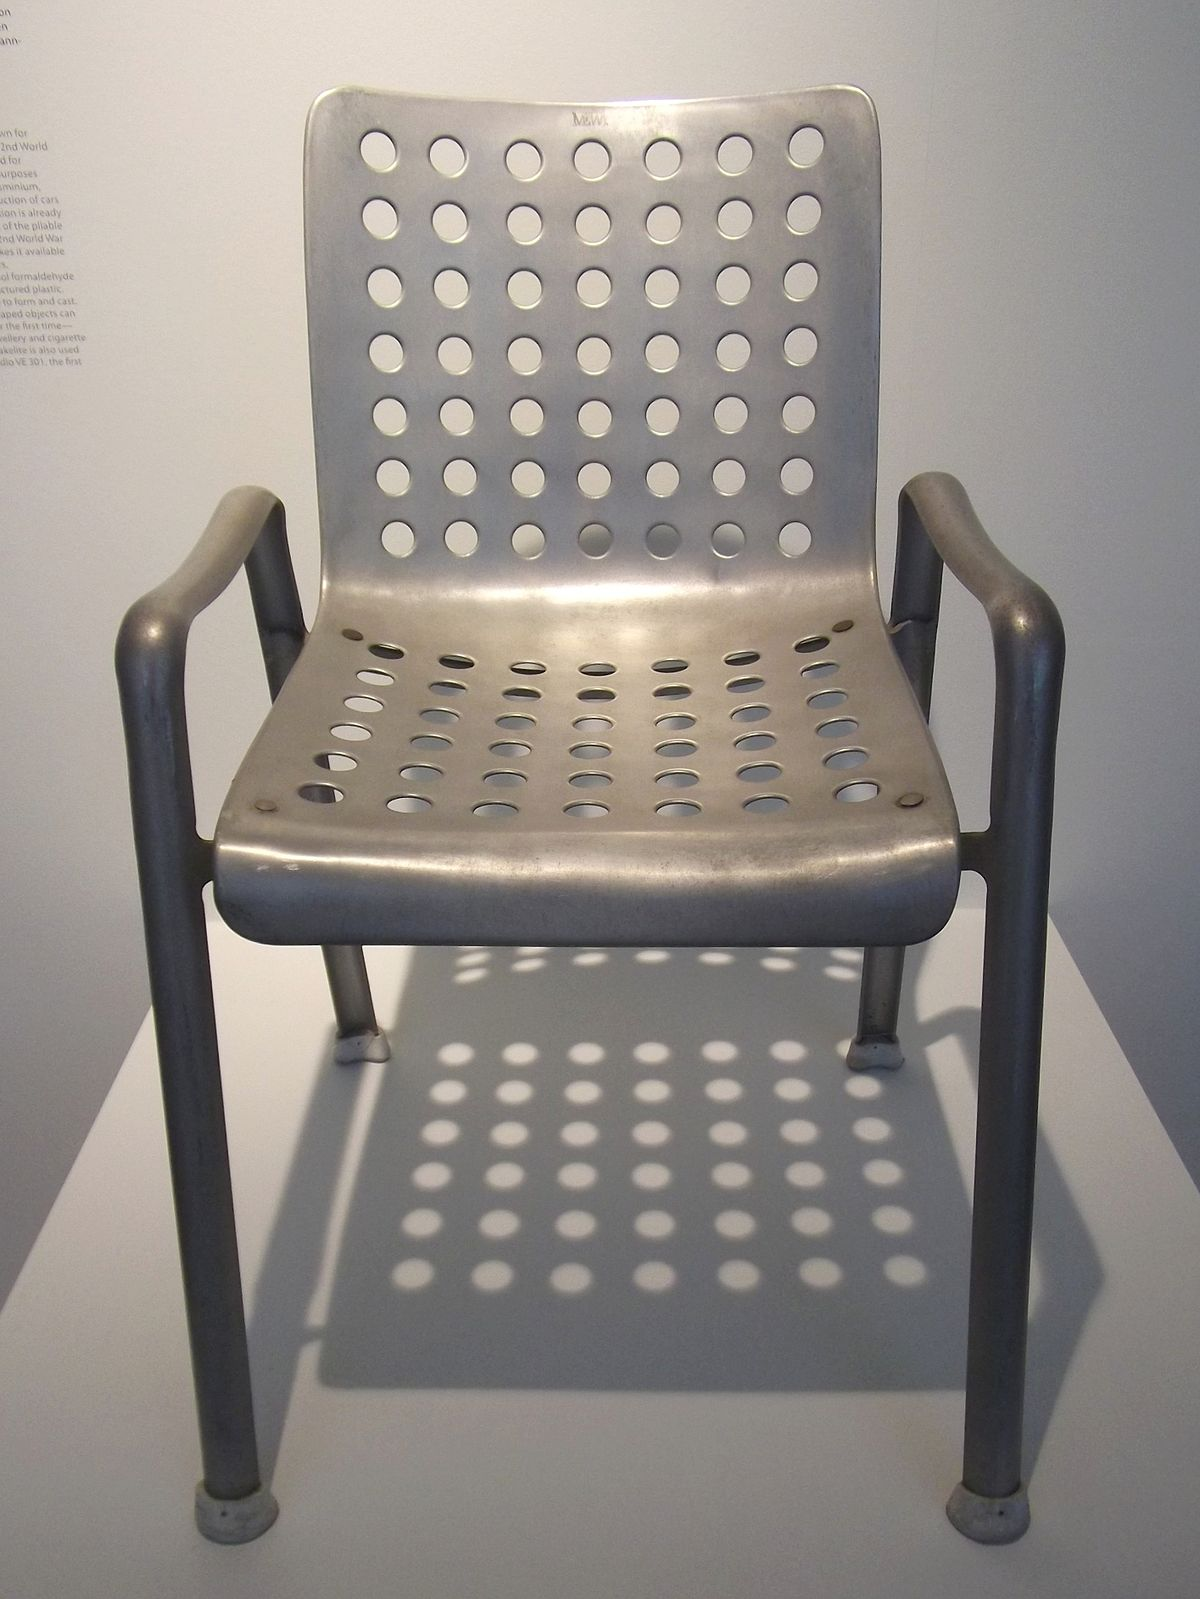 Landi stuhl wikipedia for Stuhl design geschichte